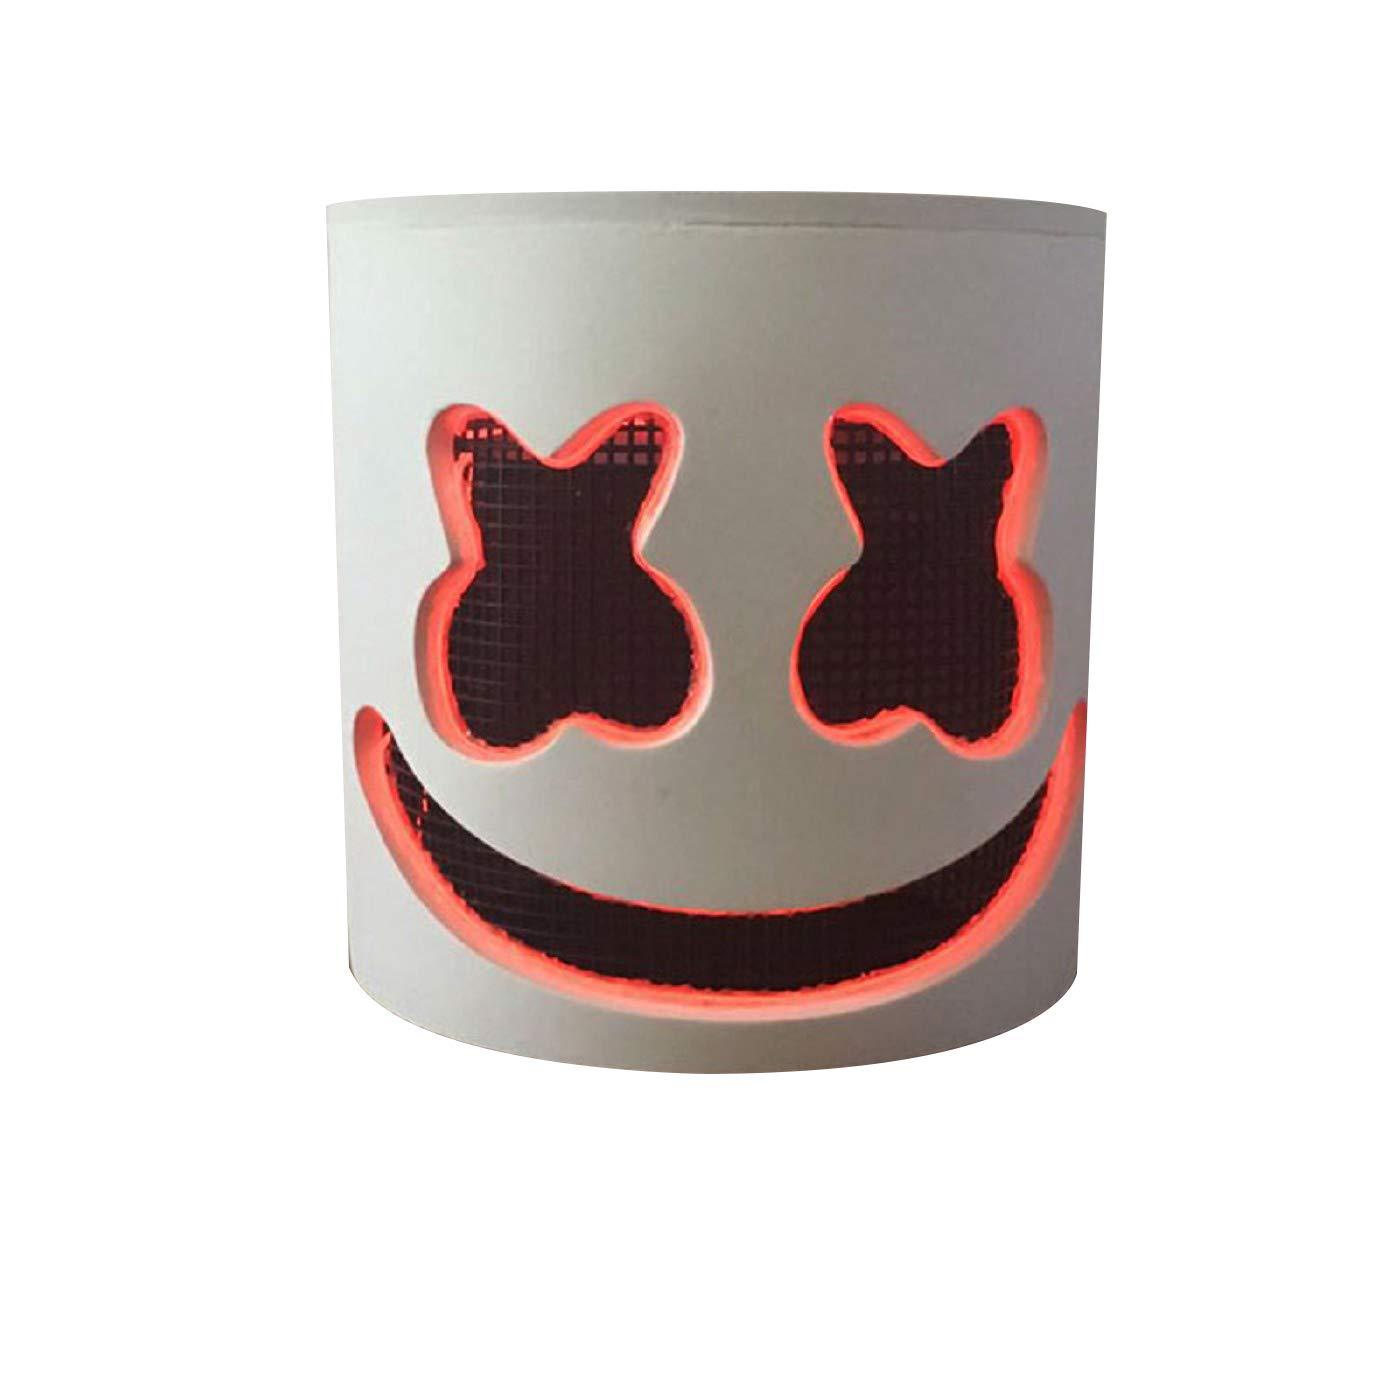 SBTD DJ Maske, Musik Festival Maske Led DJ Maske Festival Helme Neuheit Partei Maske Gummi Latex Cosplay Bar KTV Requisiten (Muster 14) 5c190a